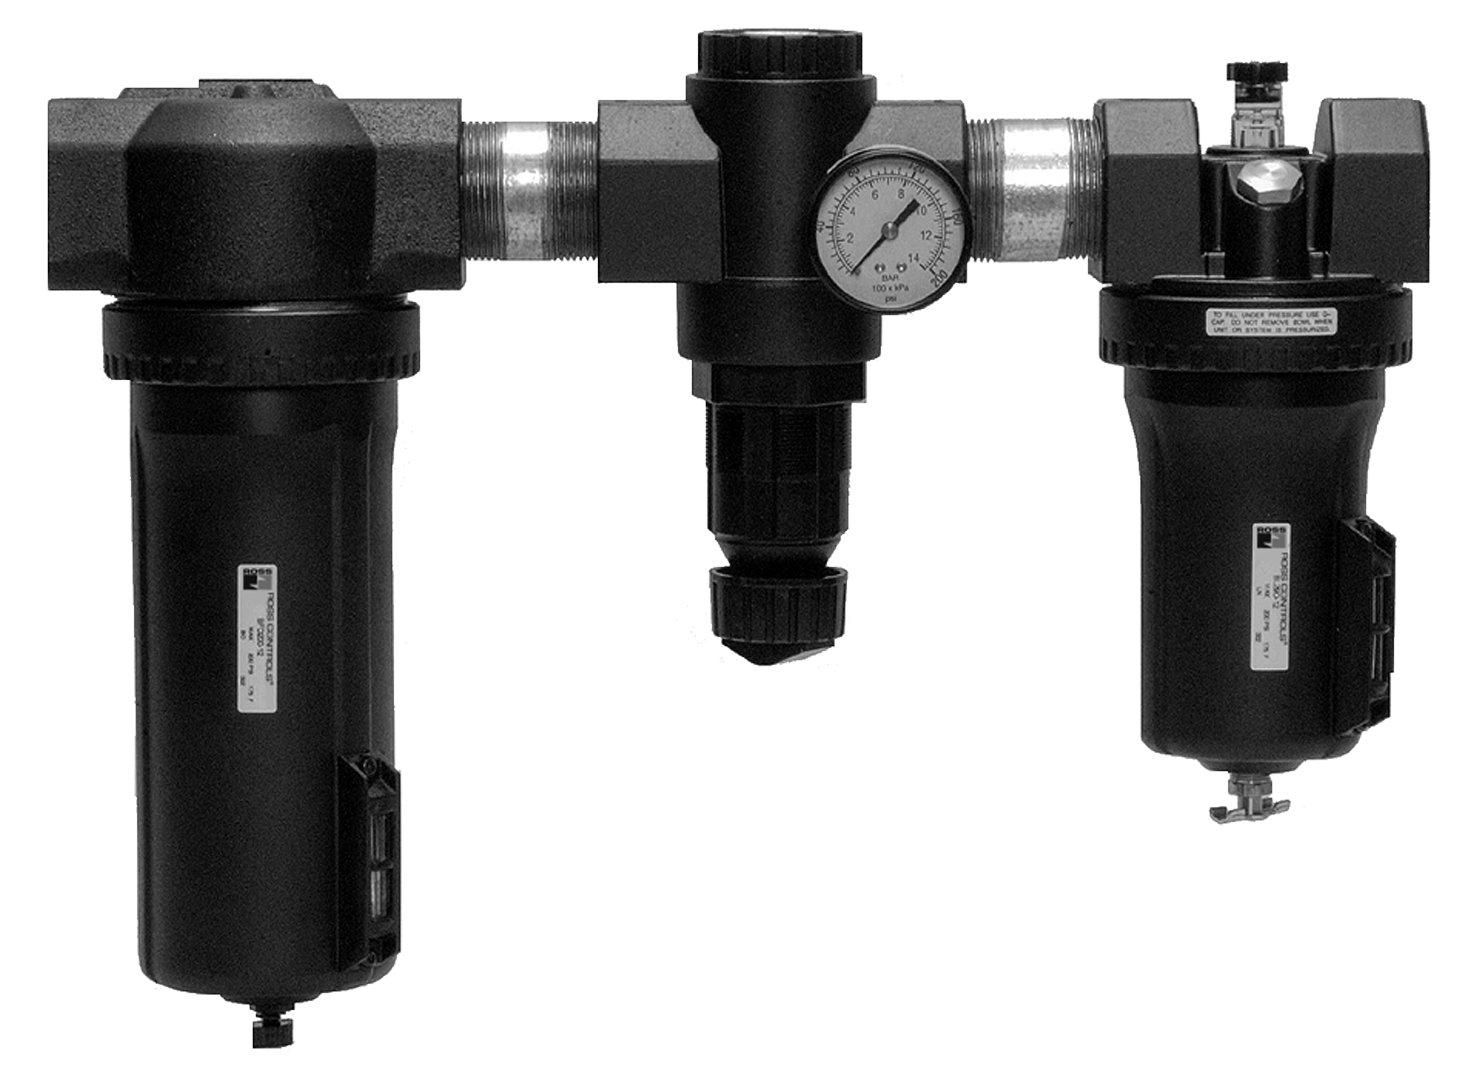 35 40 /µm Polyethylene Filter psi 0-100 Threaded Ports 1-1//4 NPT Threaded Ports 1-1//4 NPT 0-200 Metal Bowls 0-6.9 1000 Ross Controls C5H00C7412 High-Capacity Series Filter Regulator Plus Lubricator Gauge 0-14